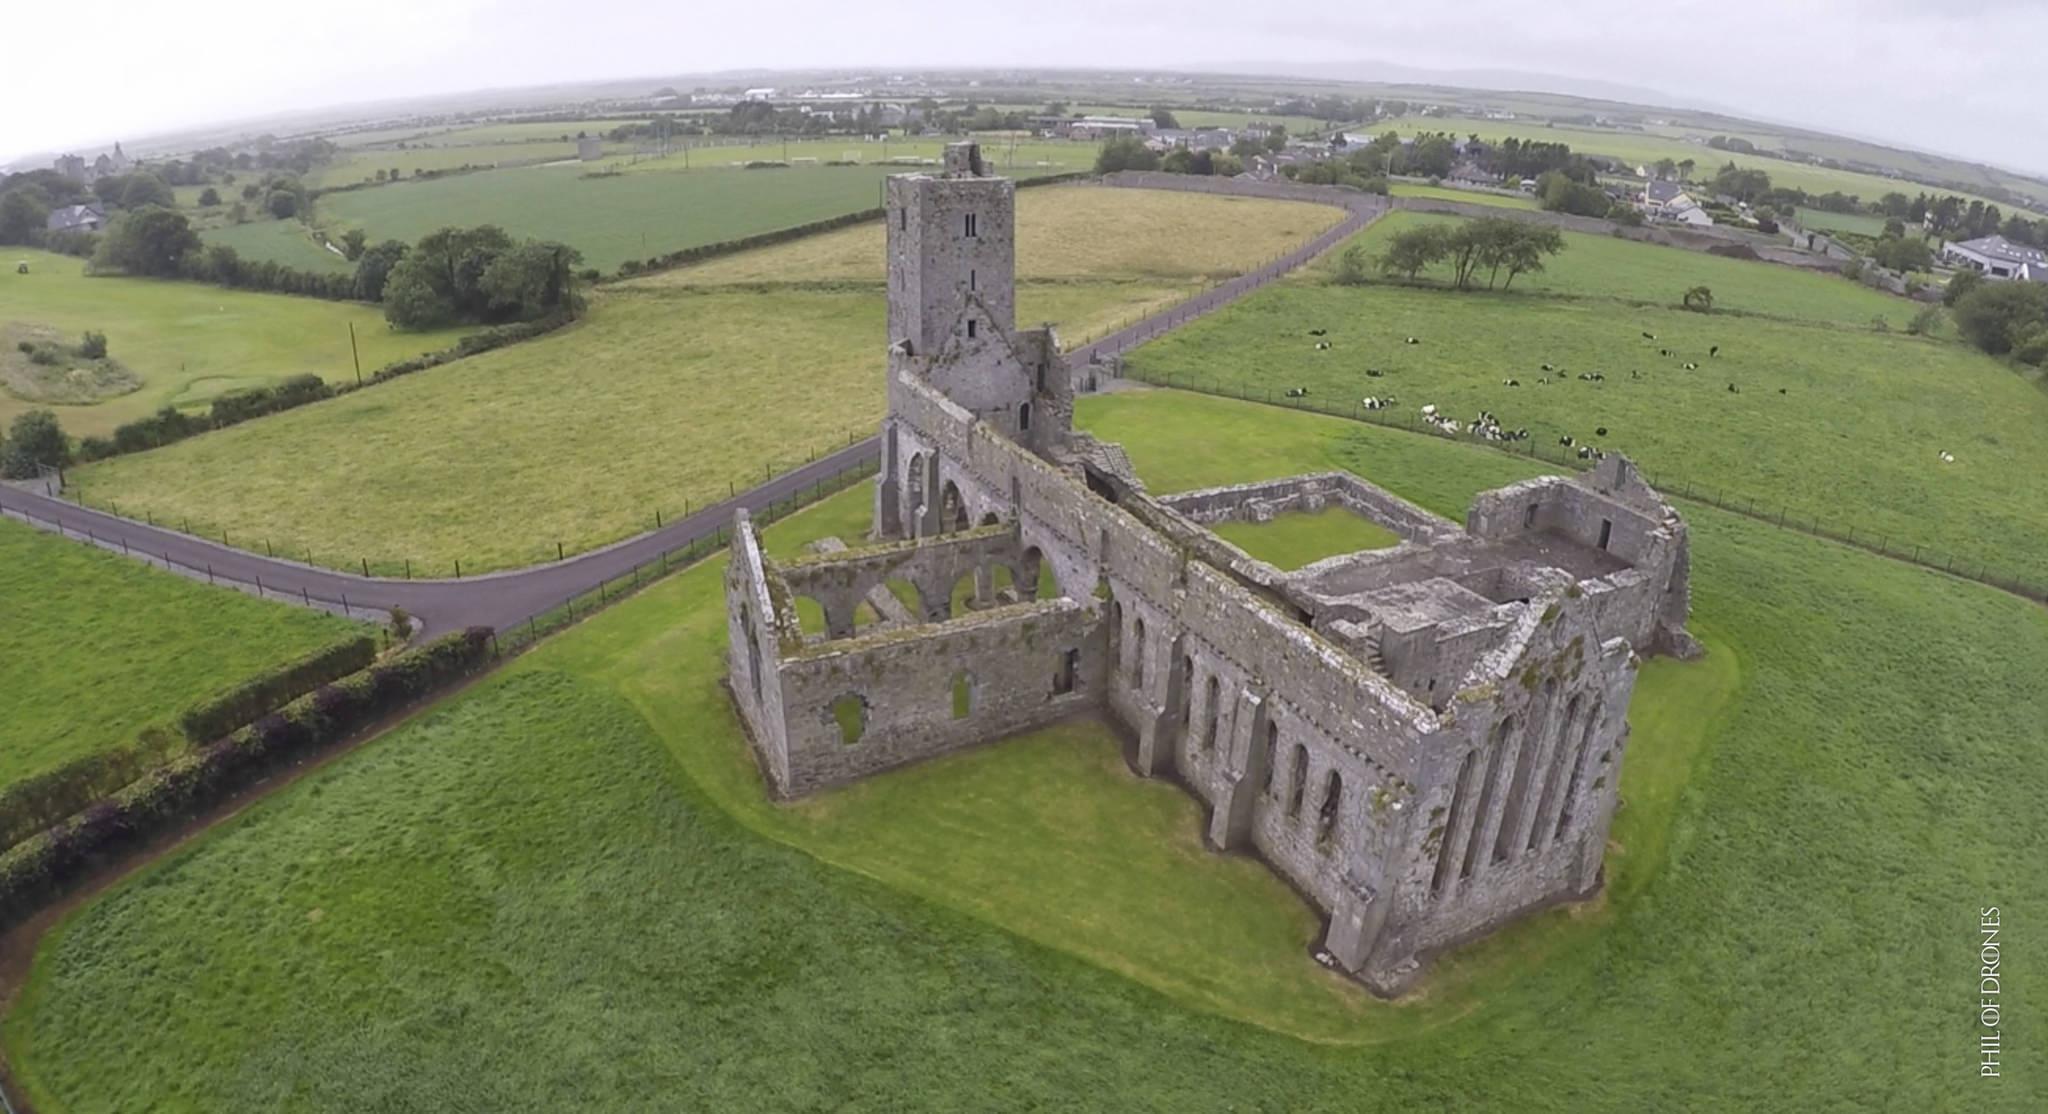 Irlande 2015-1-PhM-2.jpg